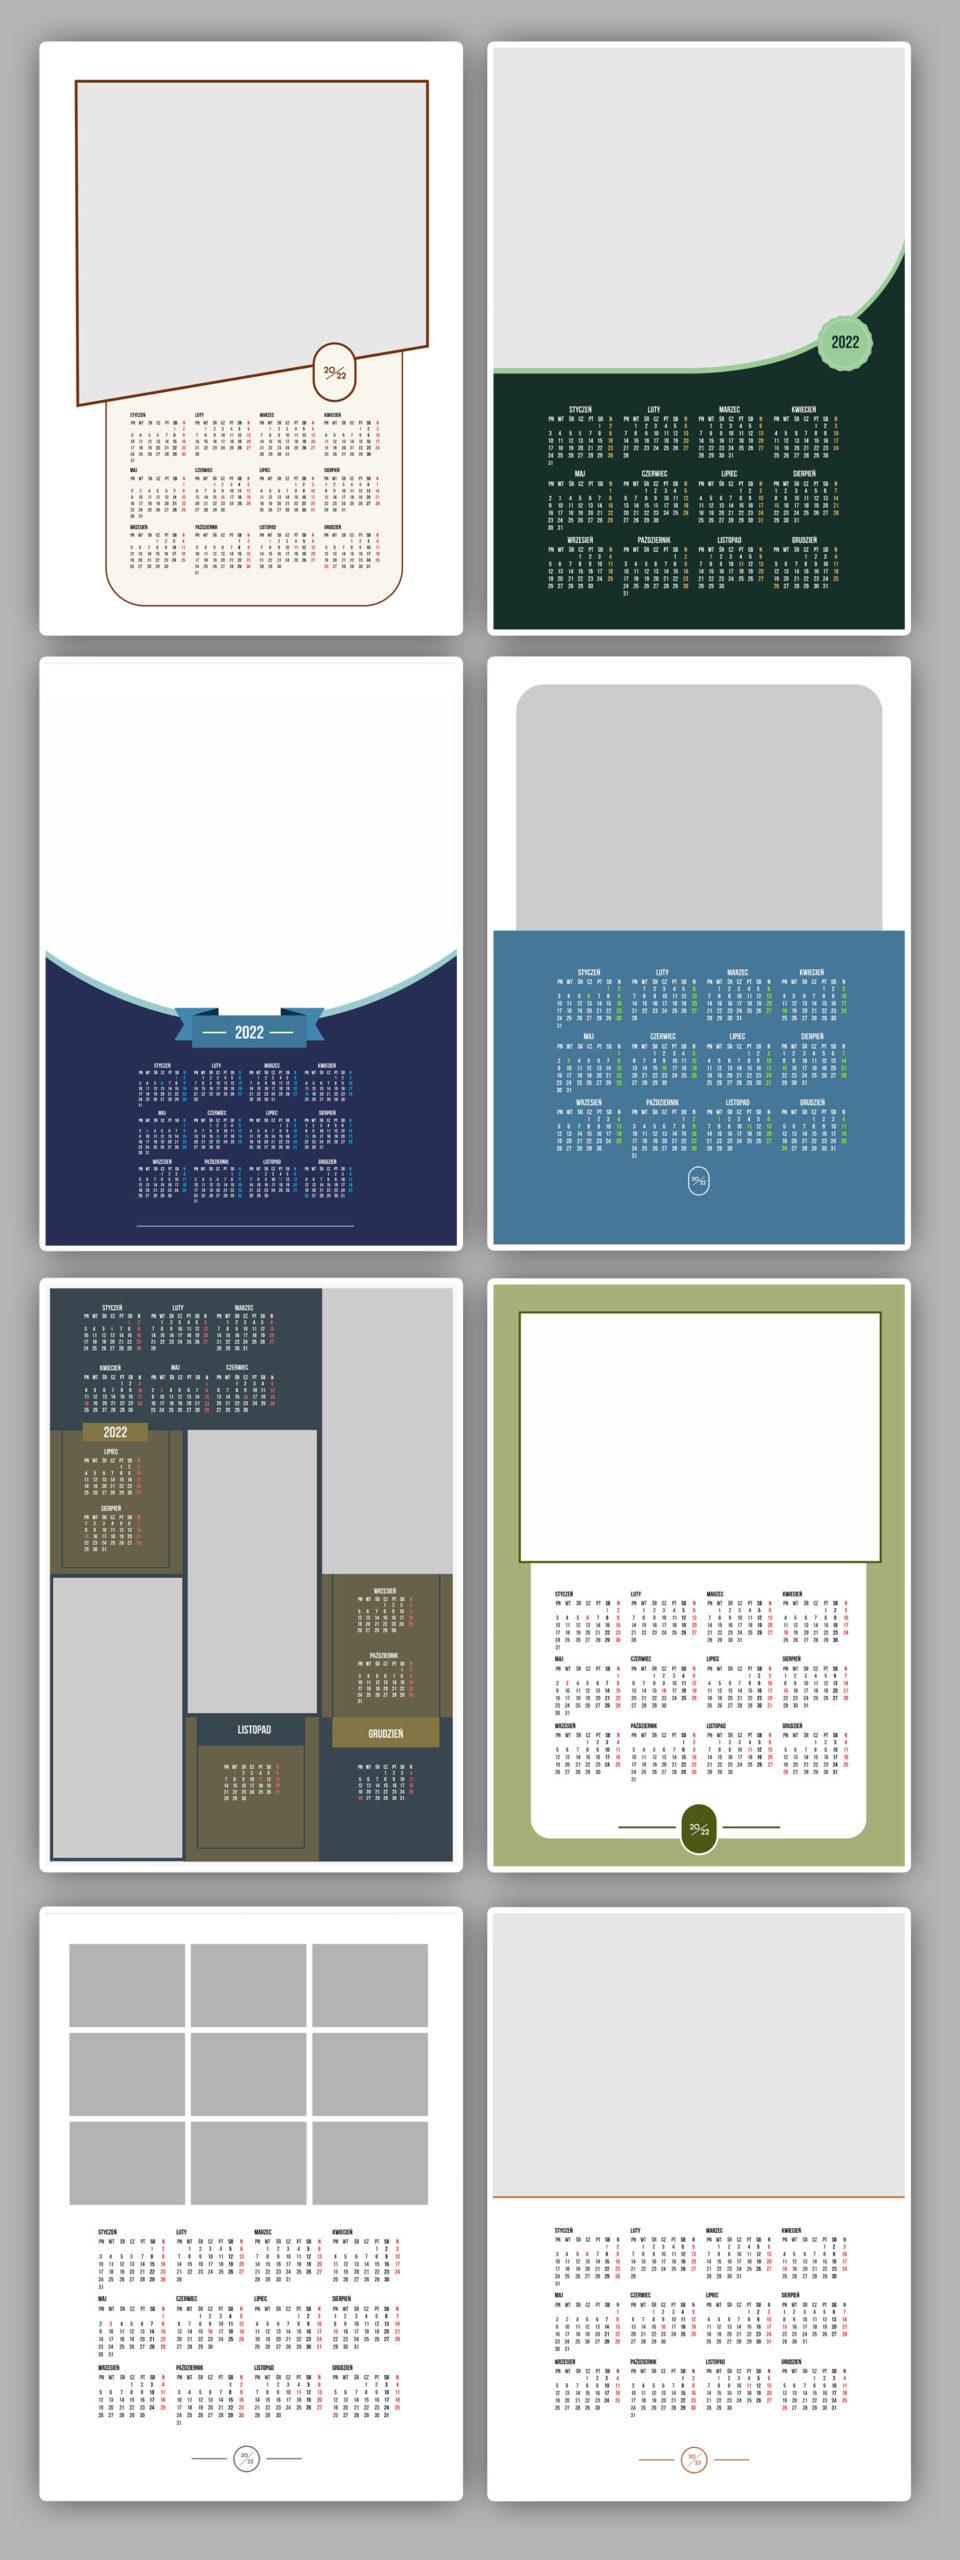 kalendarze jednostronne projekty kalendarium 2022